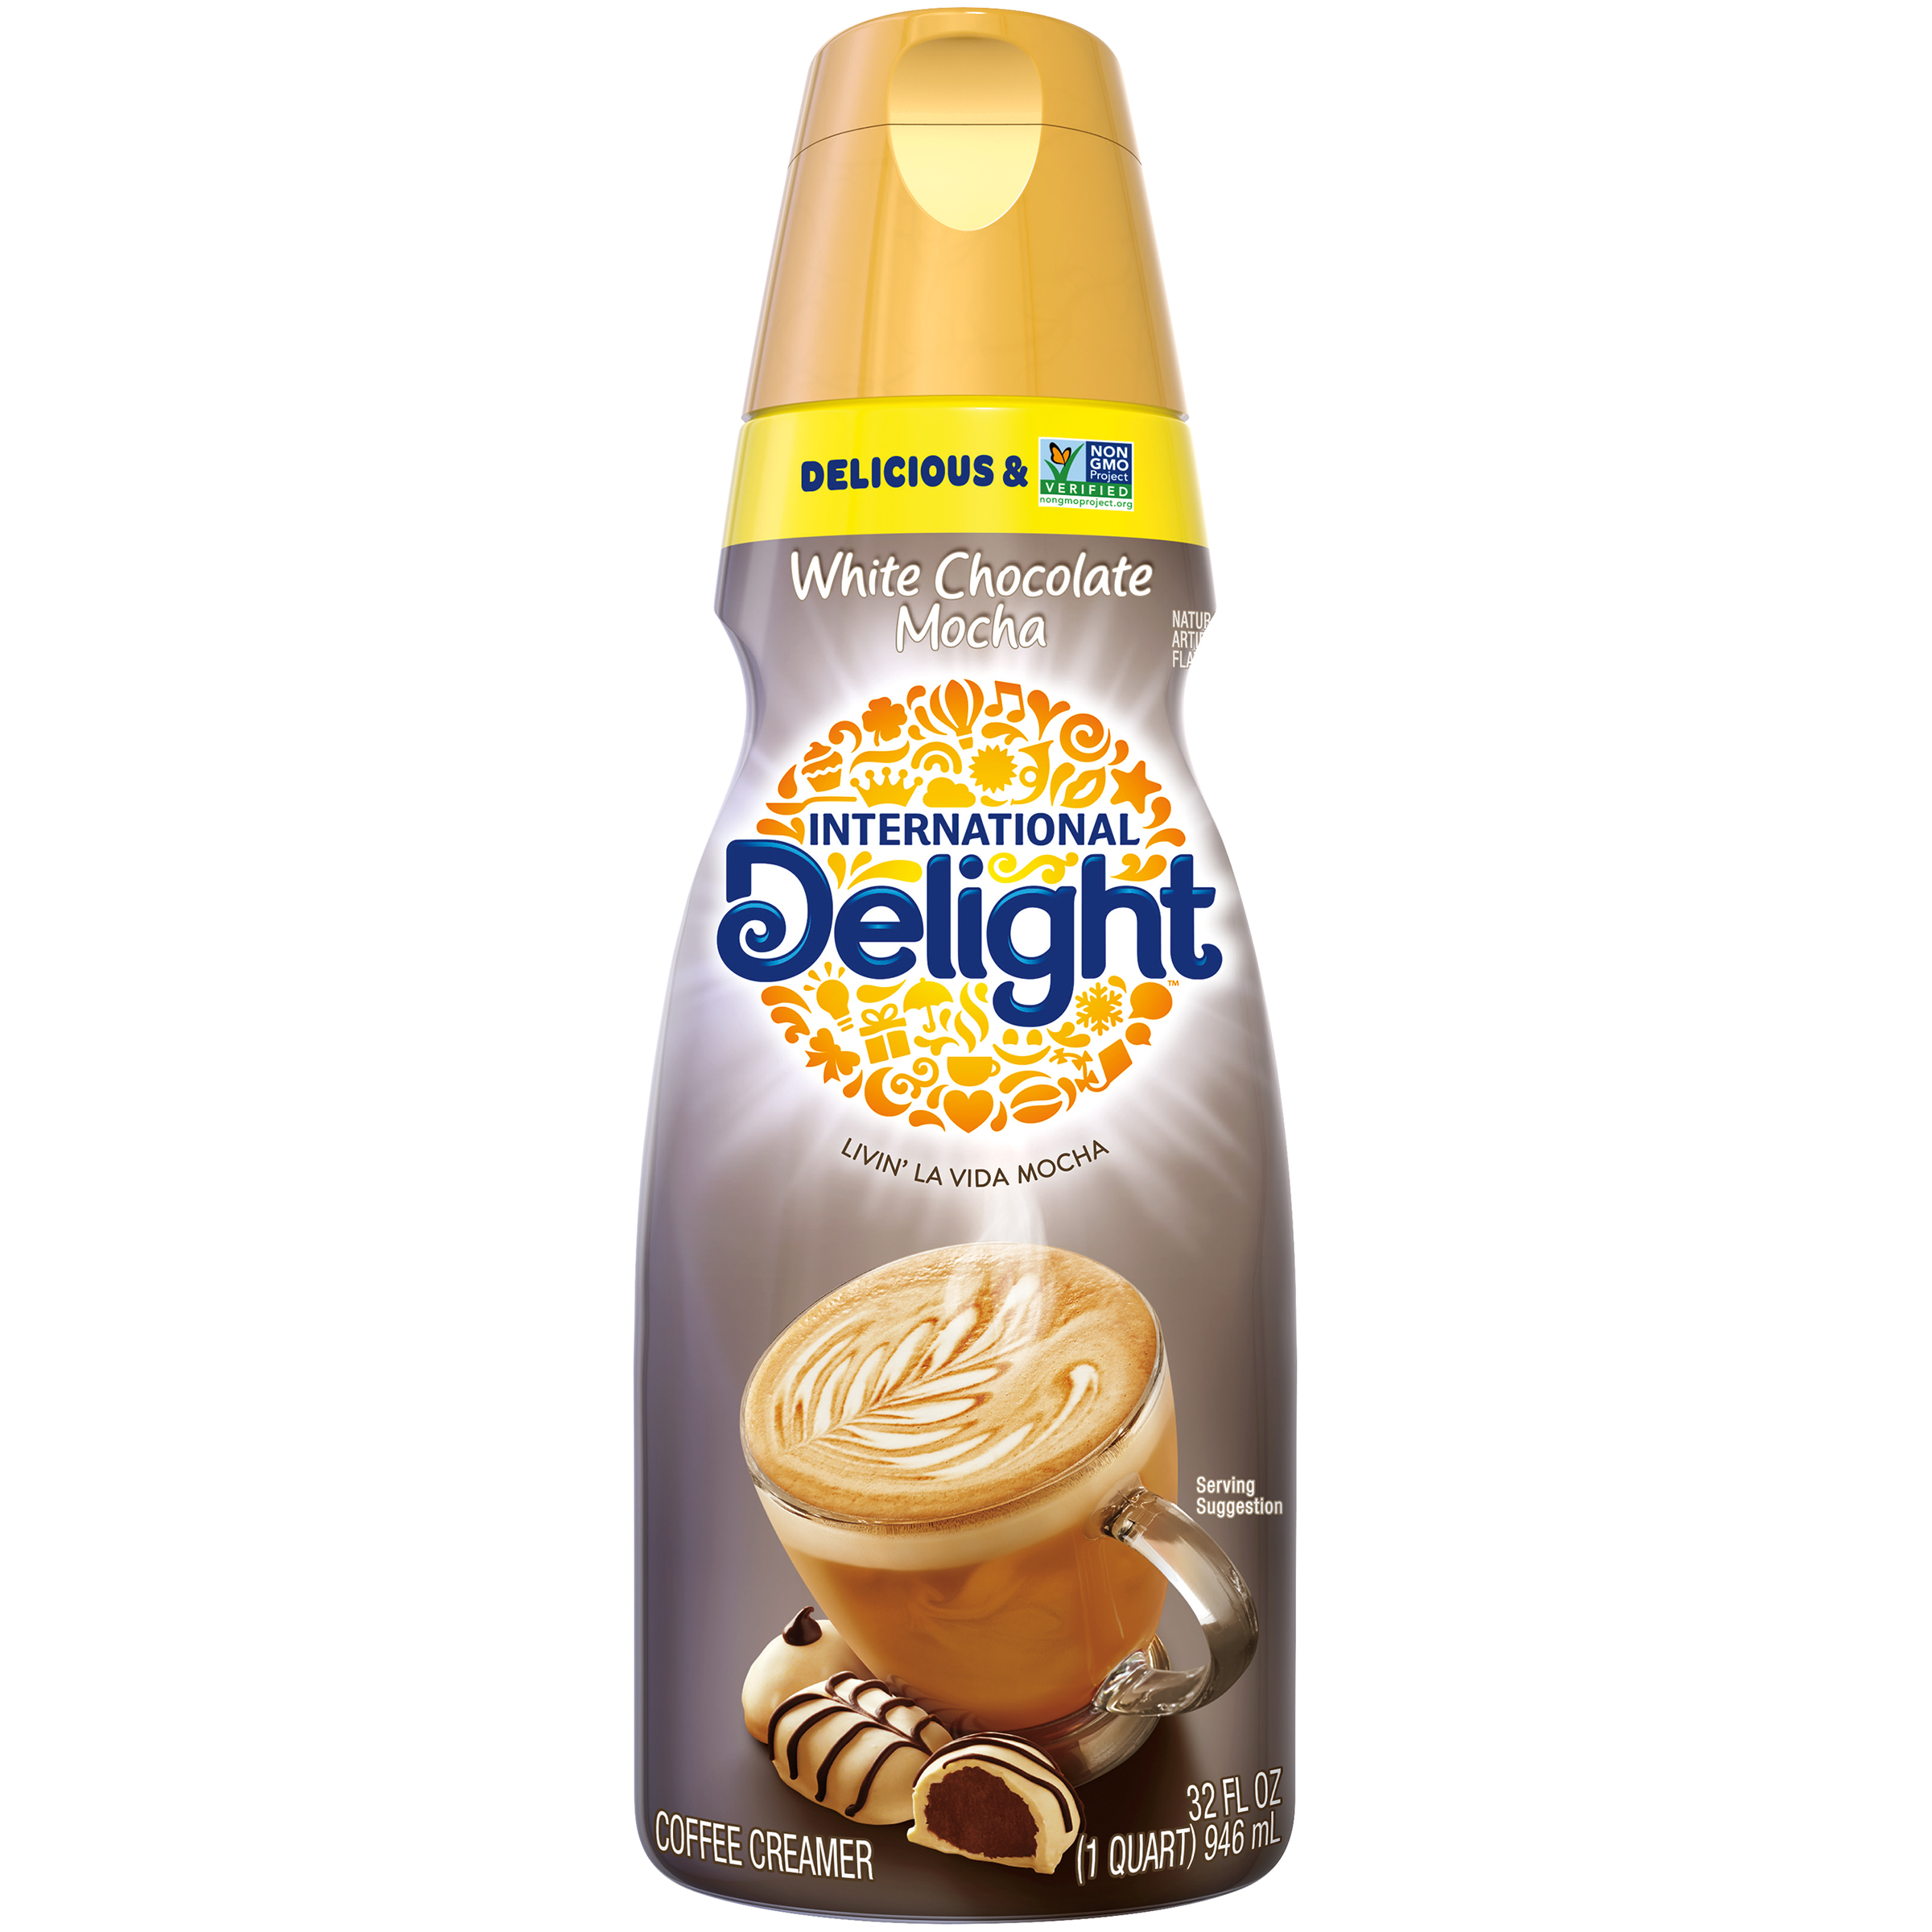 International Delight White Chocolate Mocha Coffee Creamer, 1 Quart